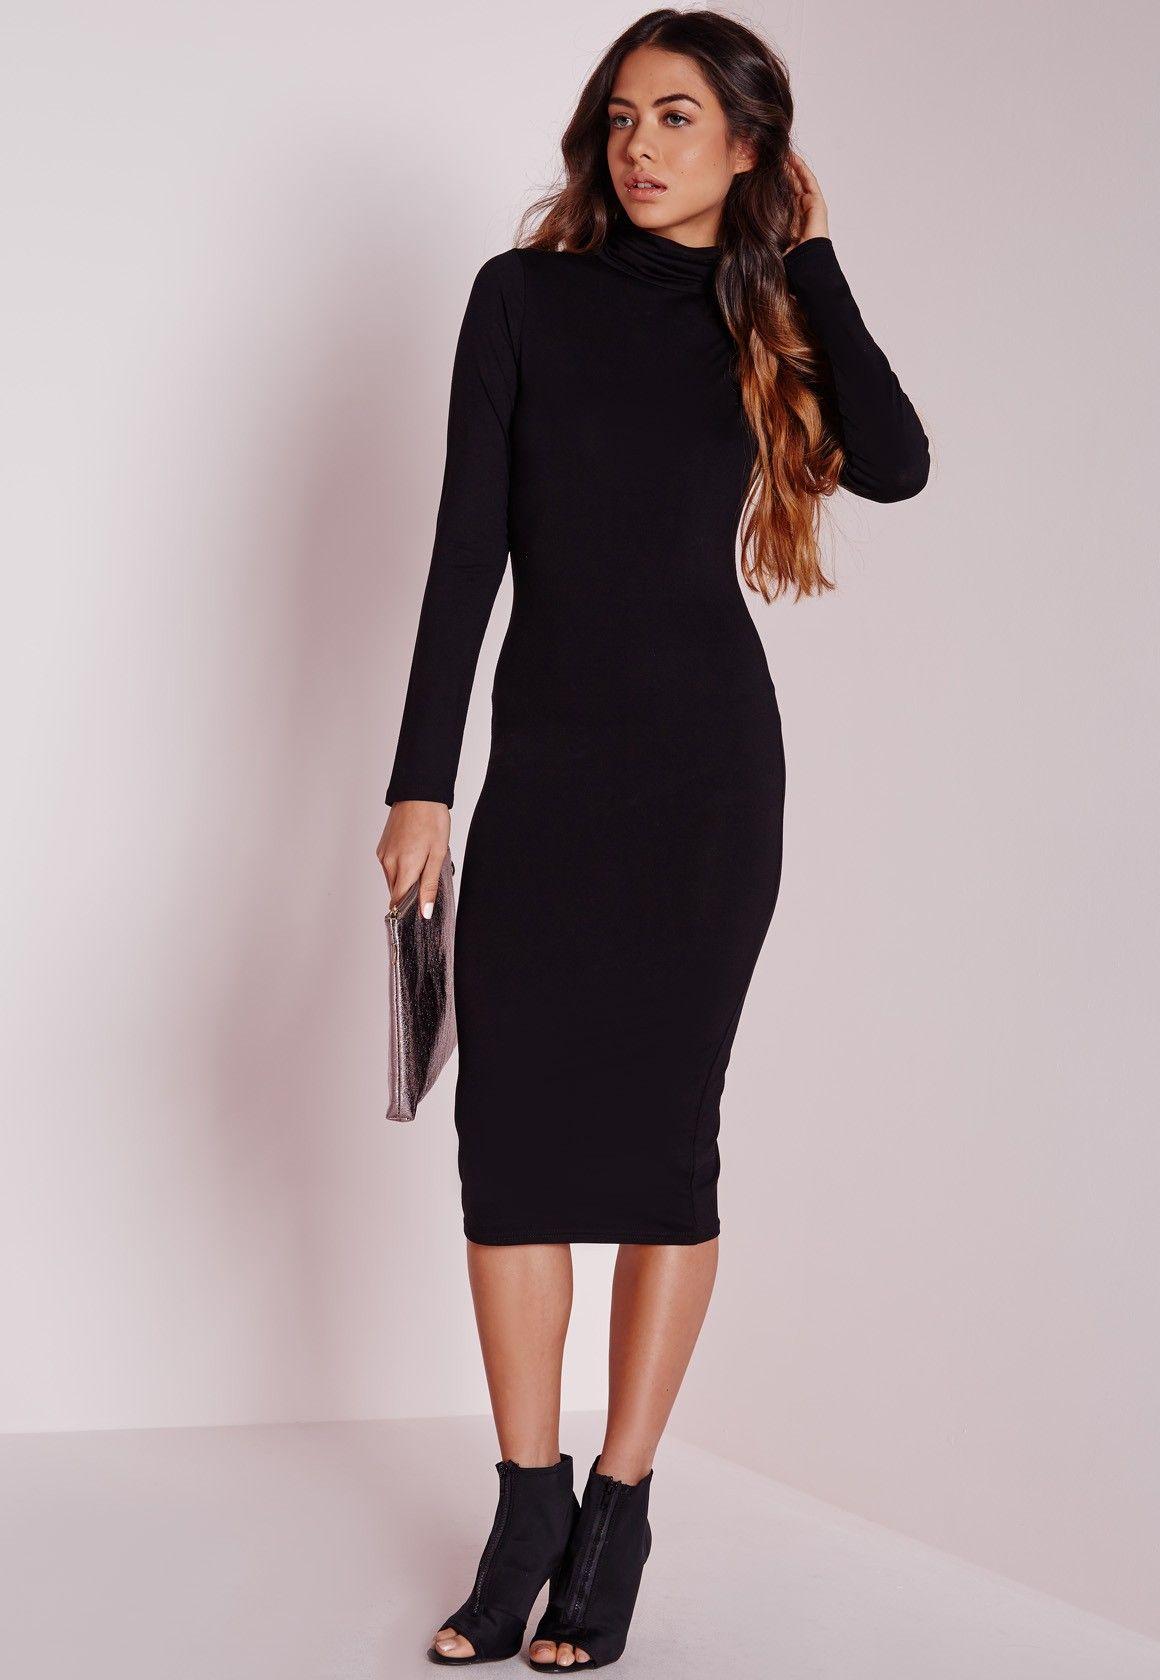 Women/'s WET LOOK PU Polo Neck /& Sleeves Jersey Bodycon Ladies Midi Dress